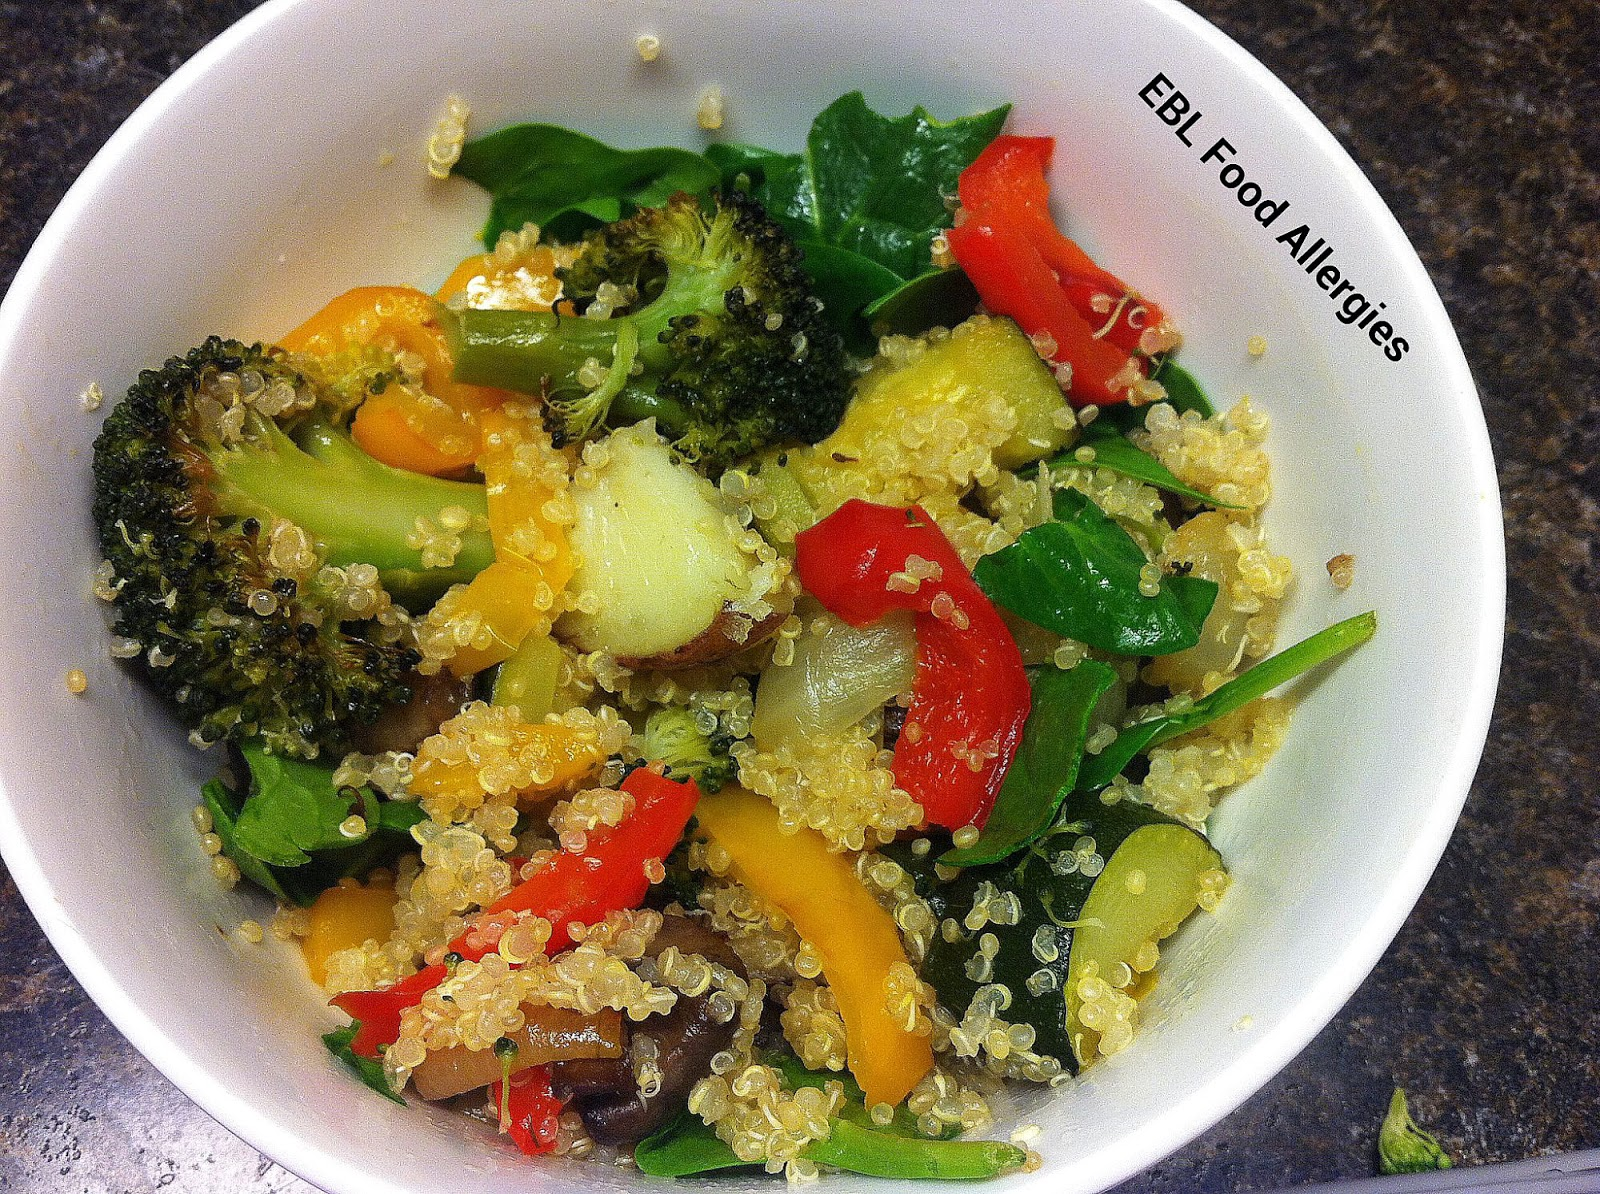 Veggie Quinoa #glutenfree #top8free